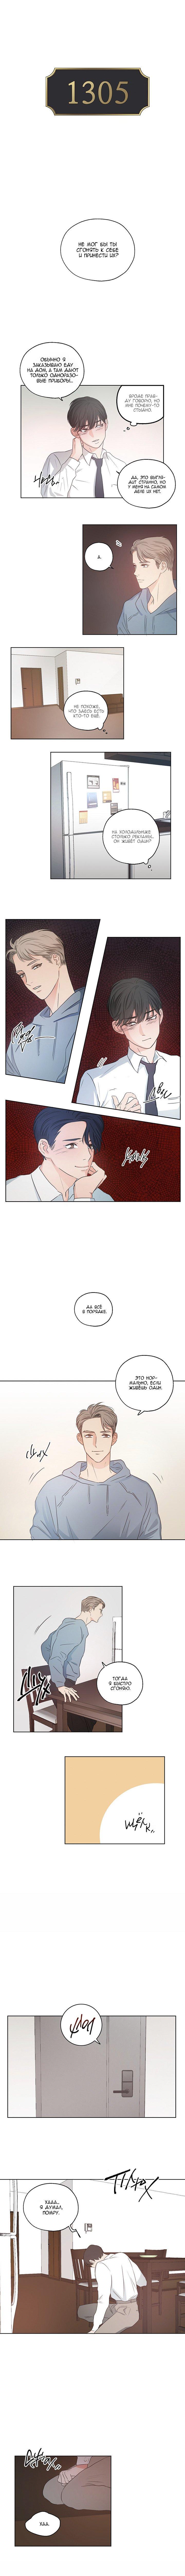 Манга 1305 - Глава 5 Страница 1